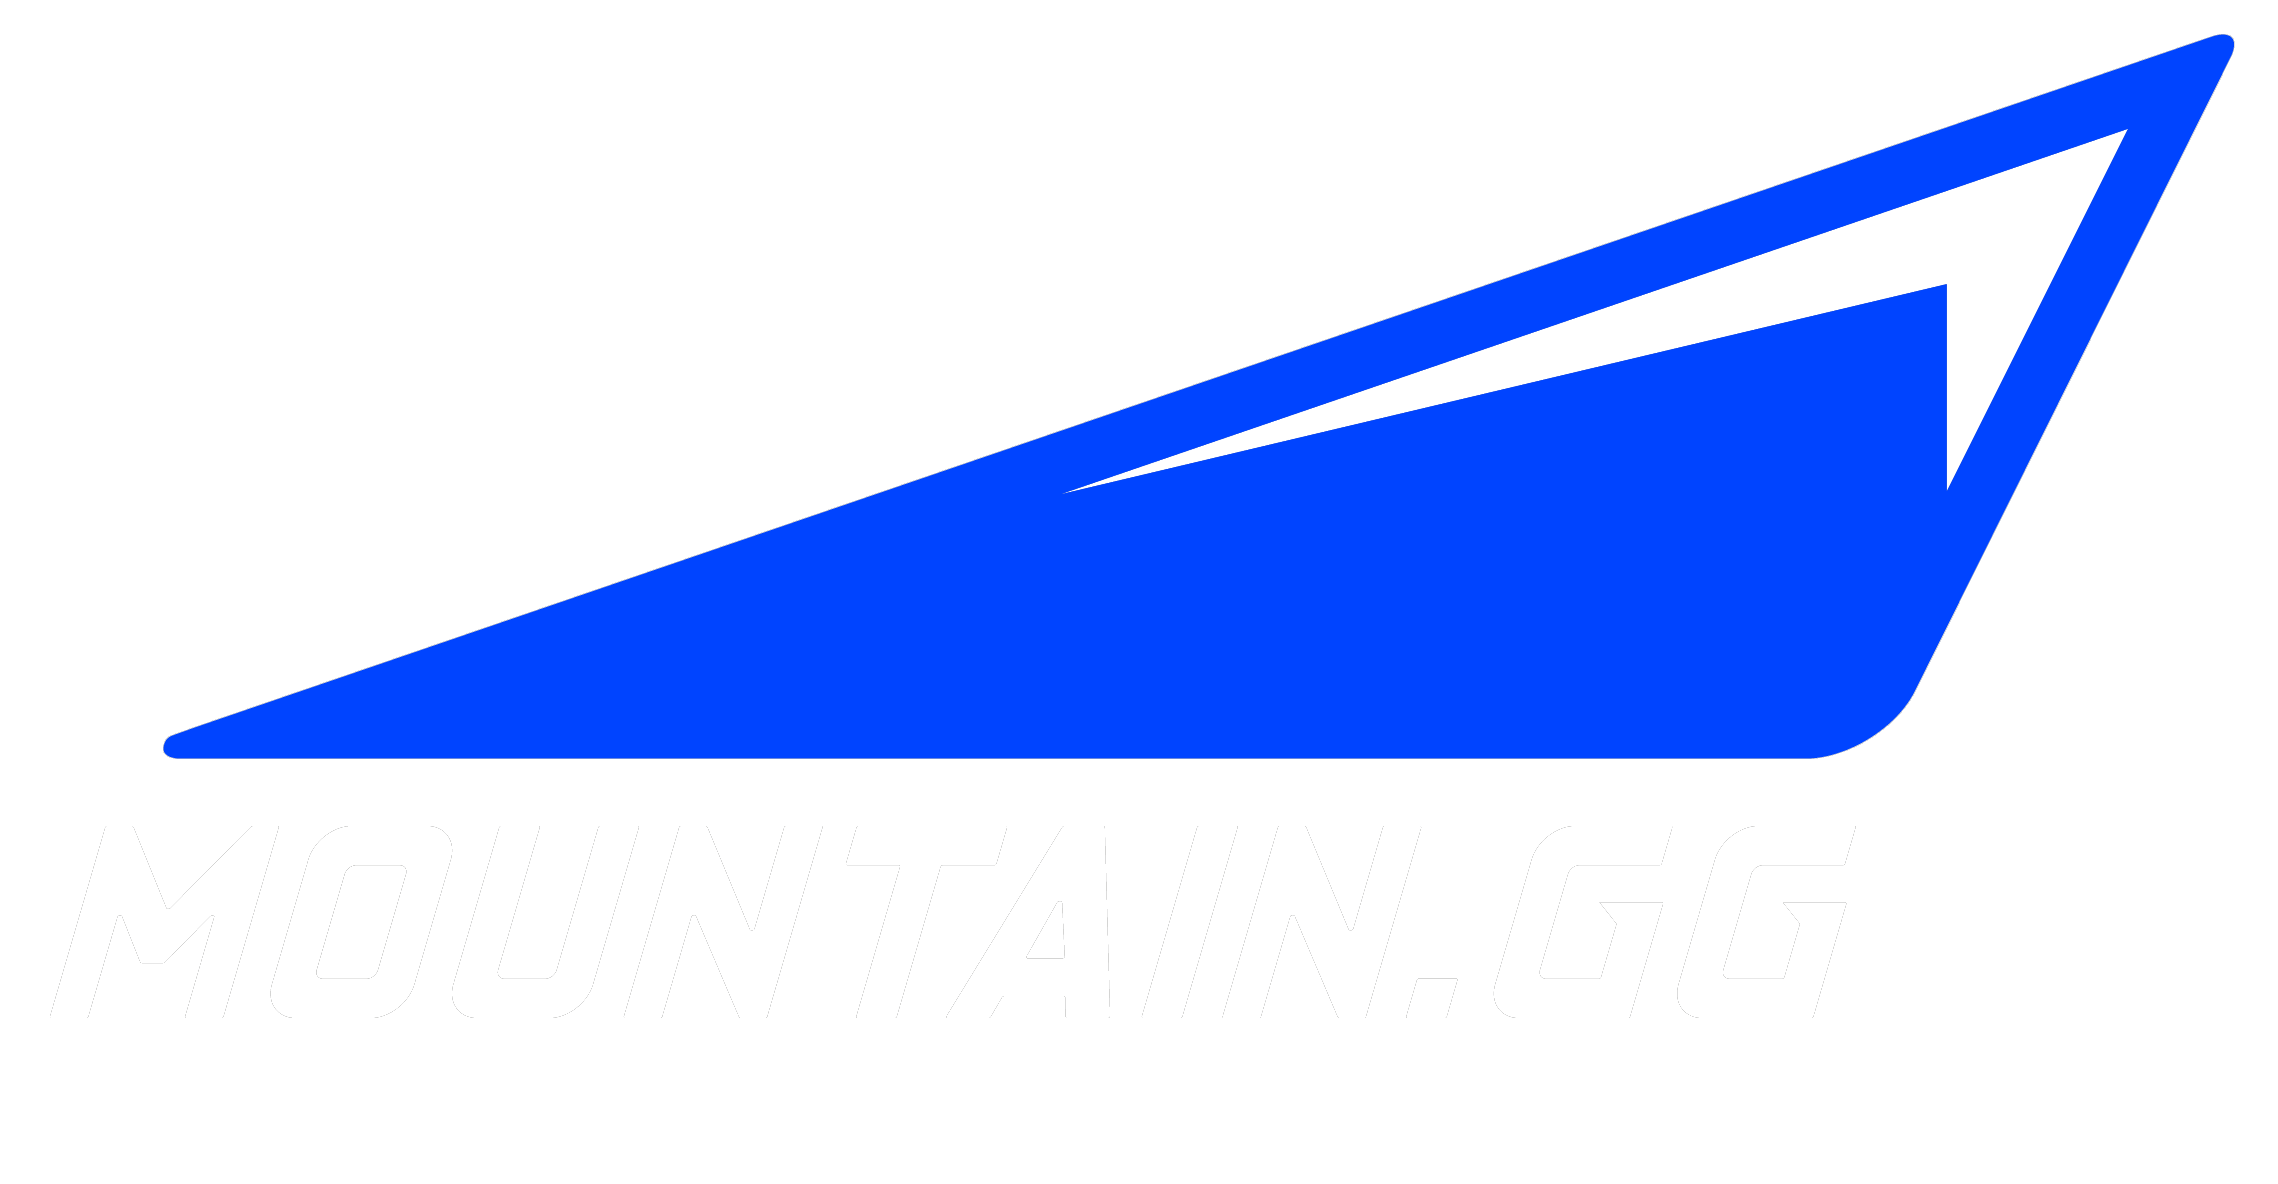 MountainGG-RGB-negative.transparent